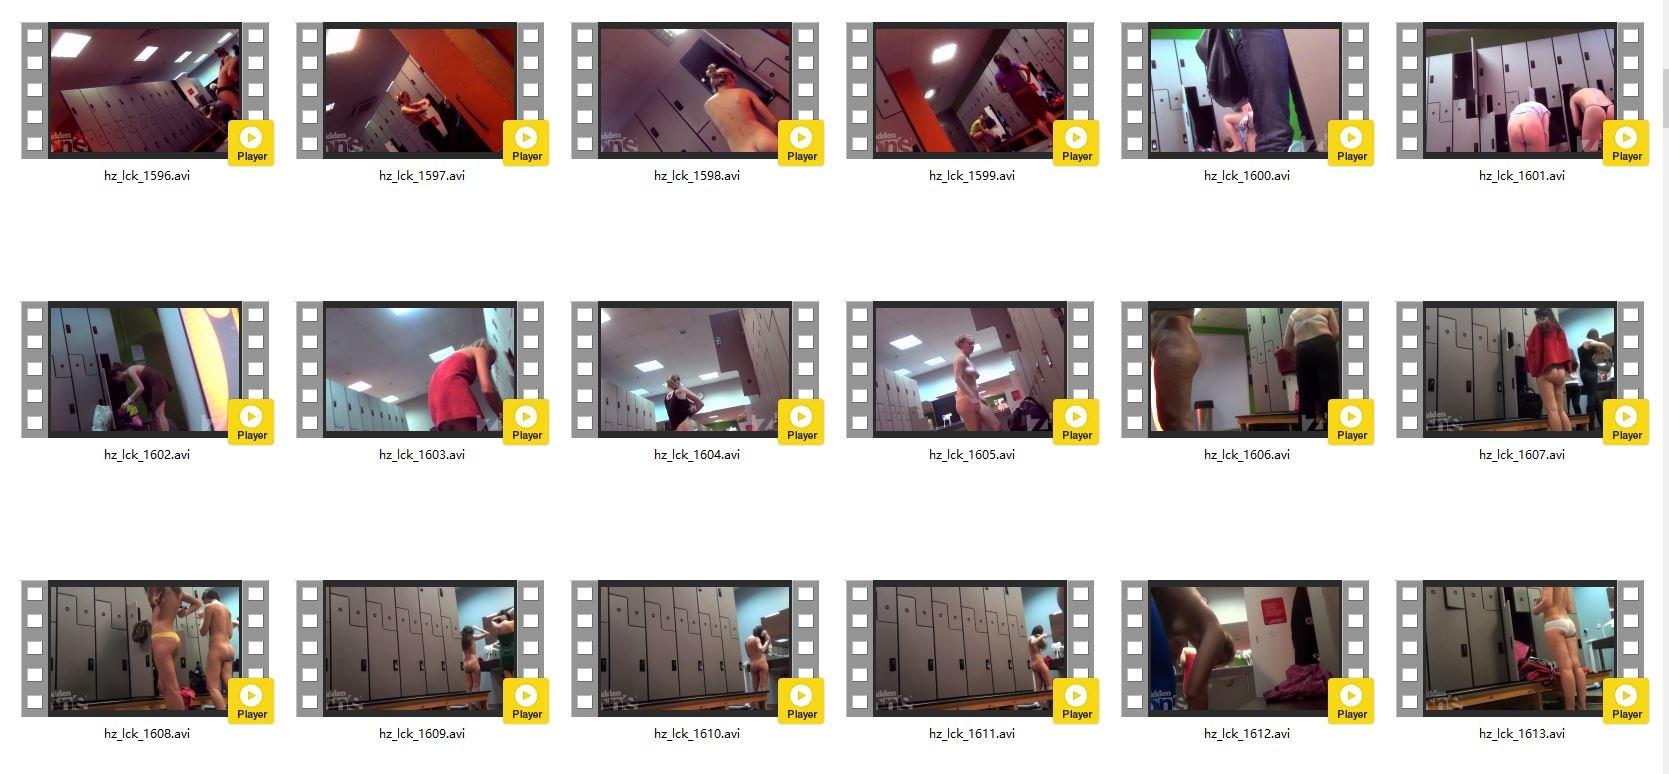 [Hidden-Zone.com] Locker 1561-1862  Feb 2015 - Dec 2017